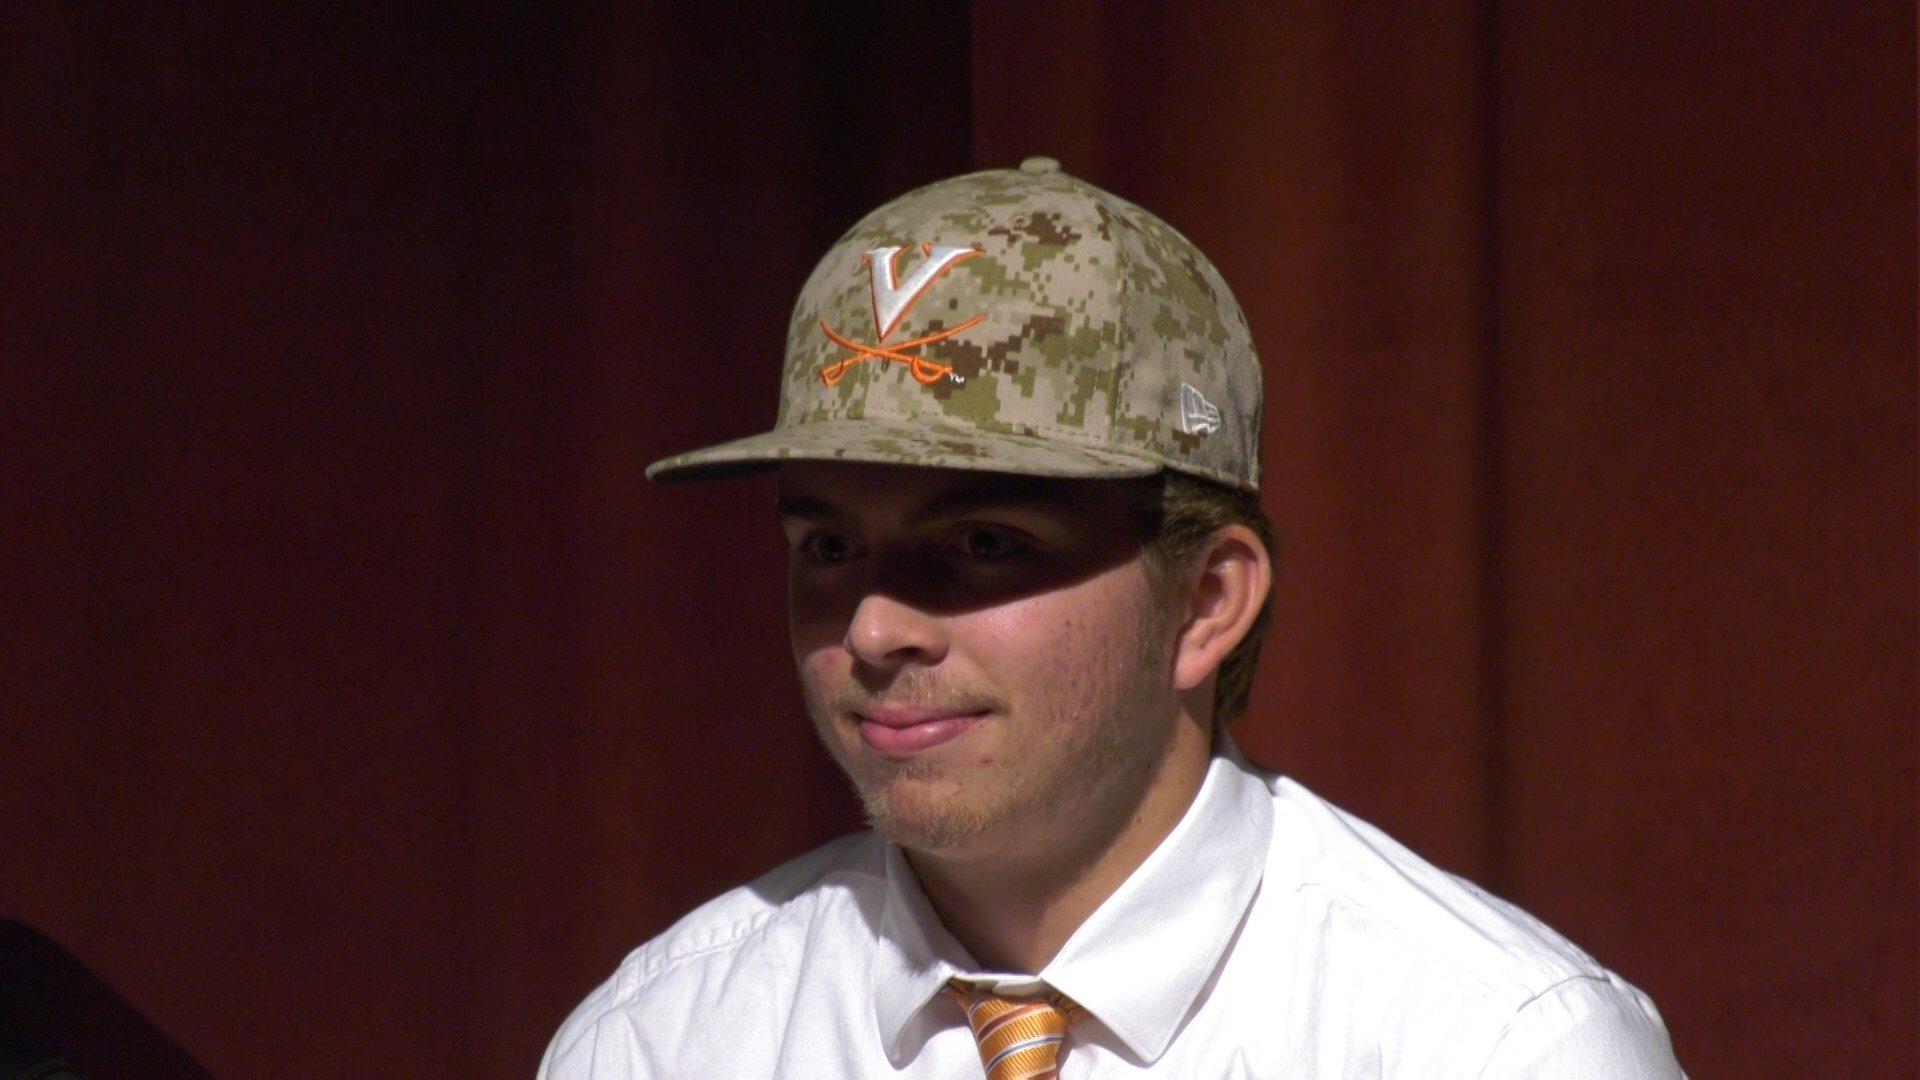 Nic Kent signed to play baseball at the University of Virginia